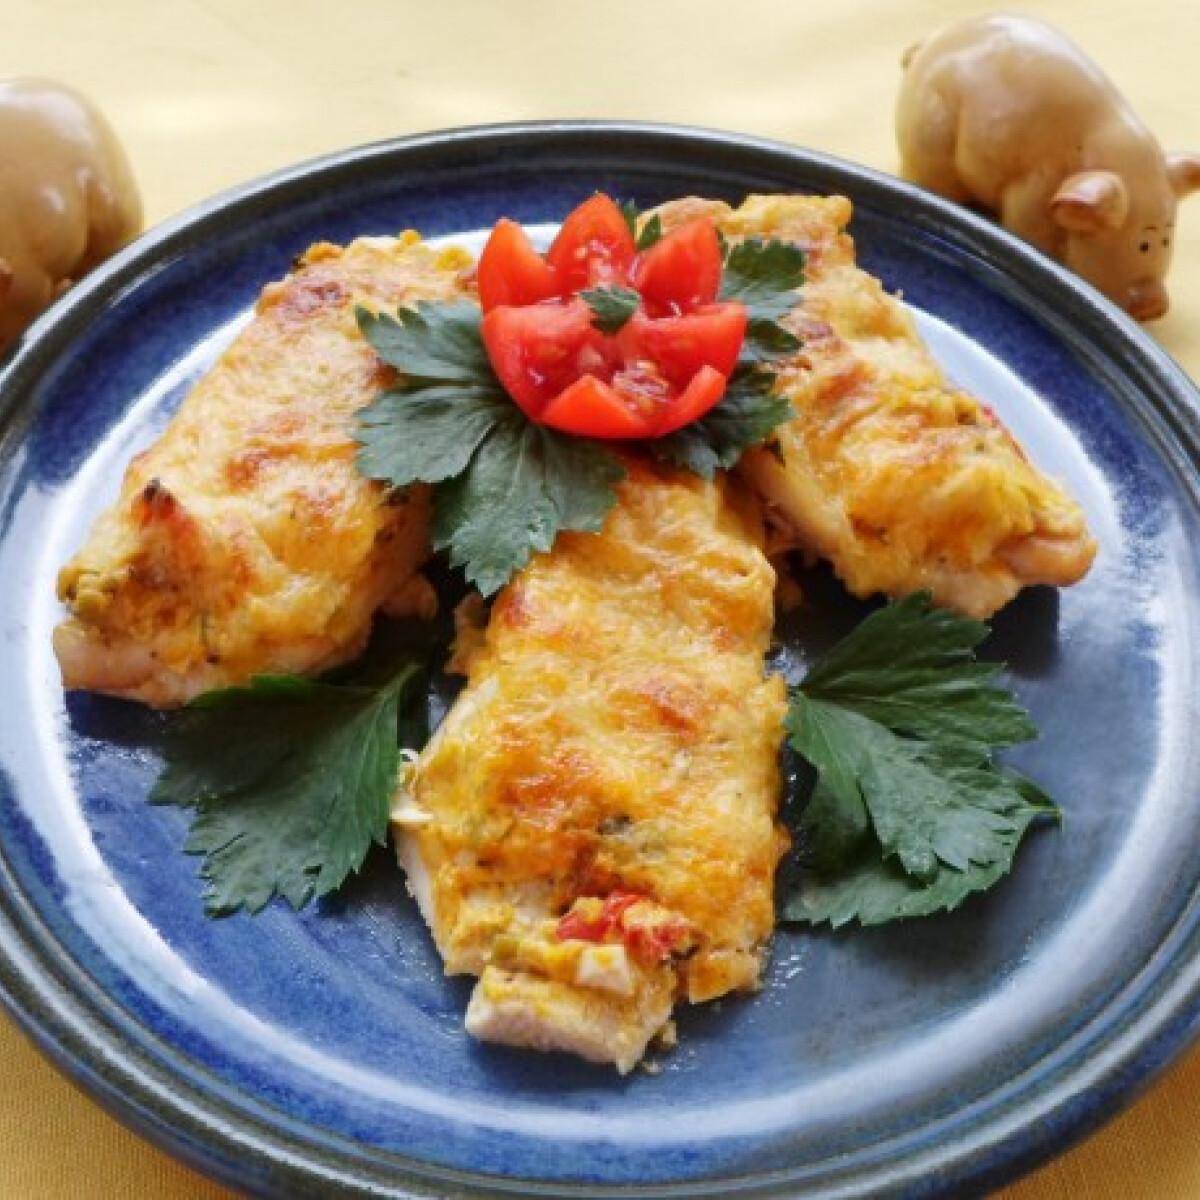 Murai zöldséges csirkemell